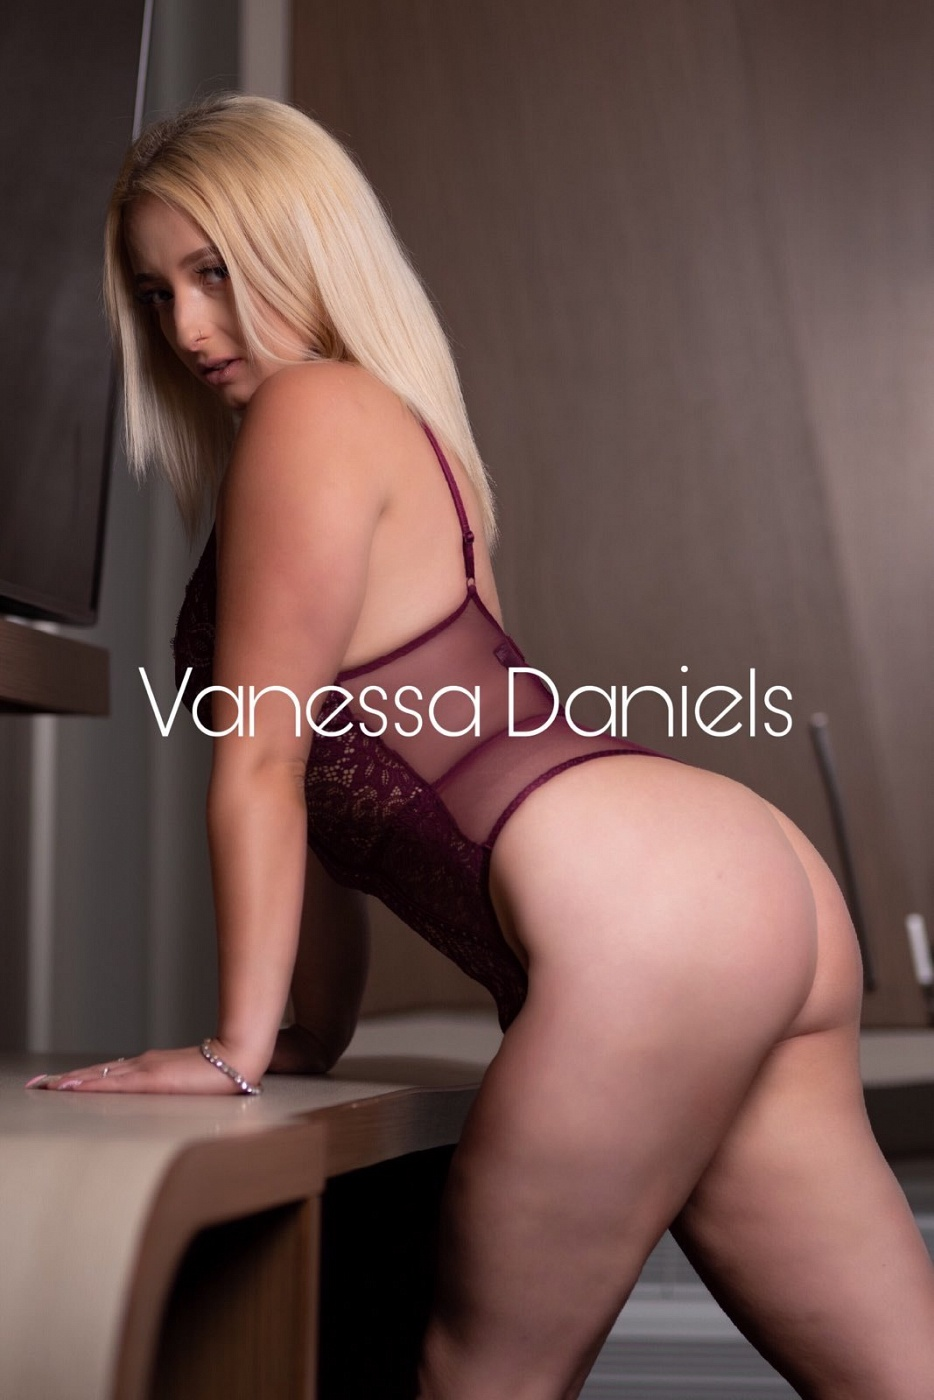 Vanessa Daniels